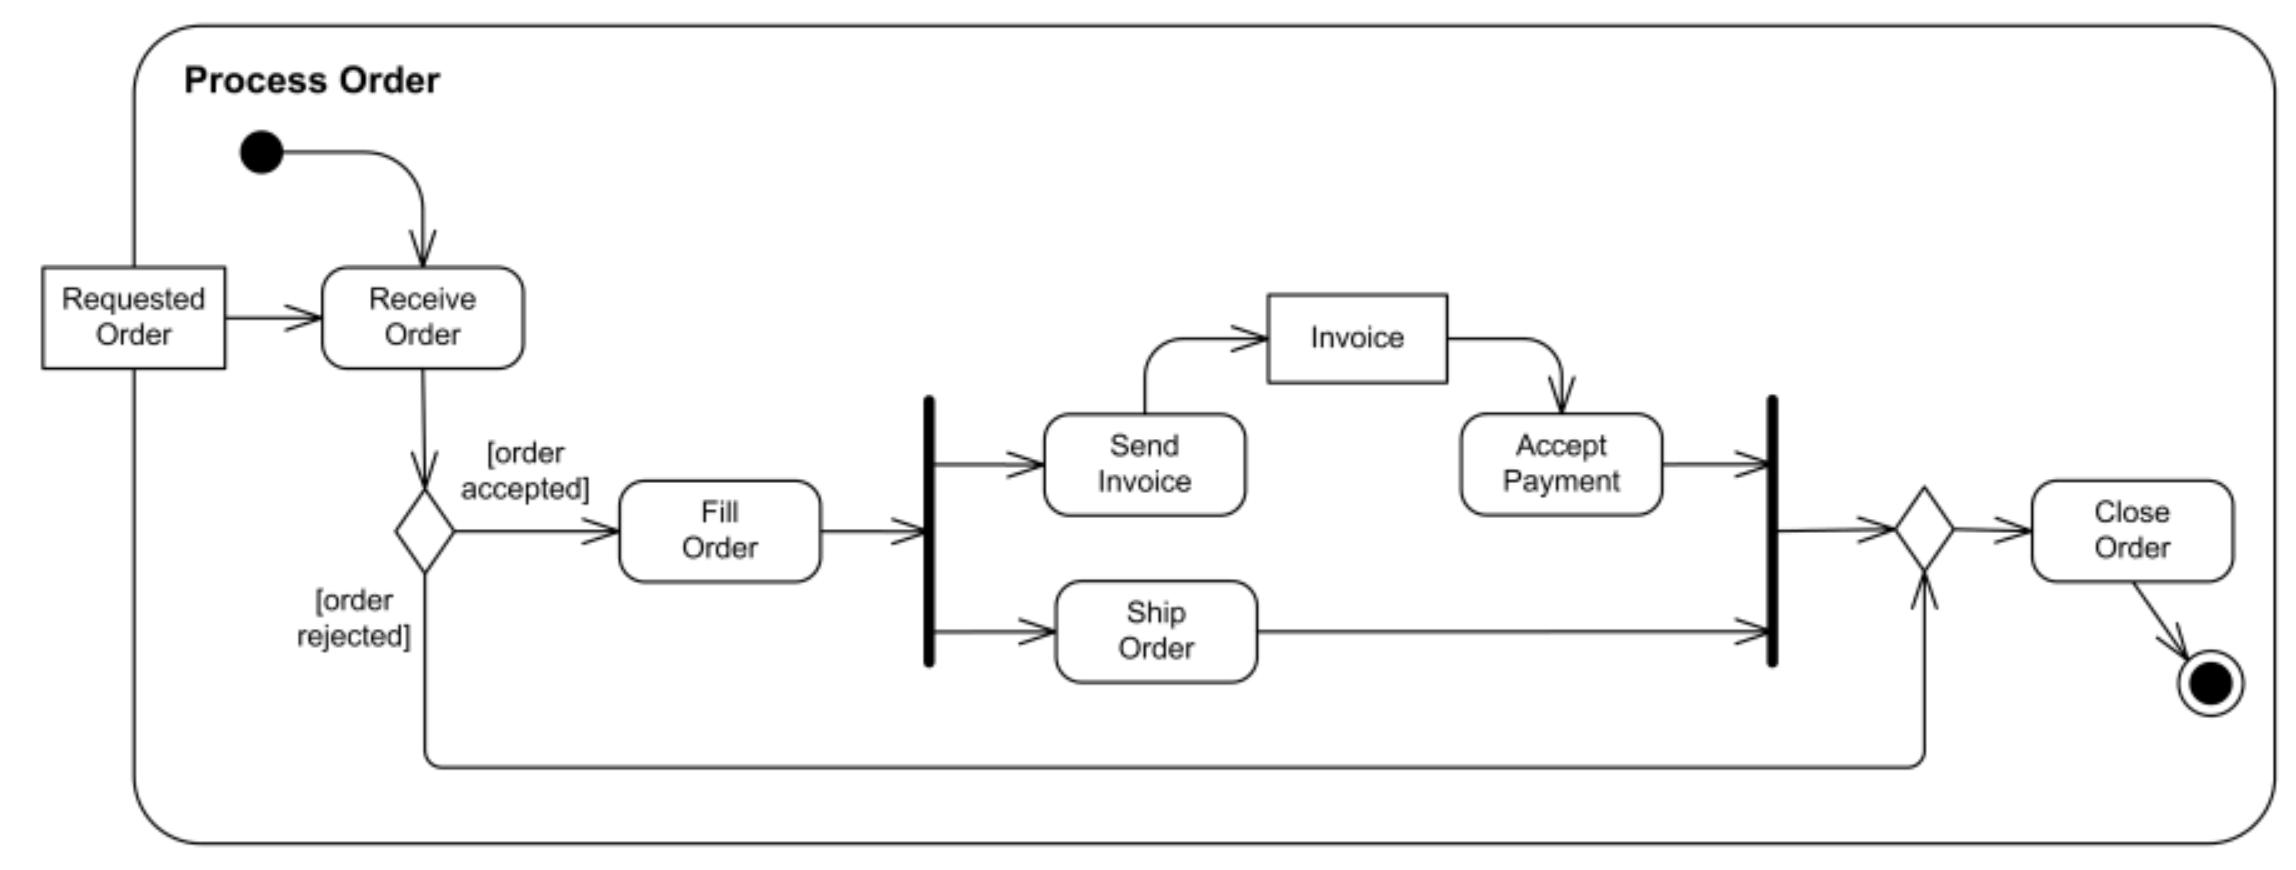 Uml Tutorial Activity Diagram Example Order Processing Activity Diagram Business Process Management Business Process